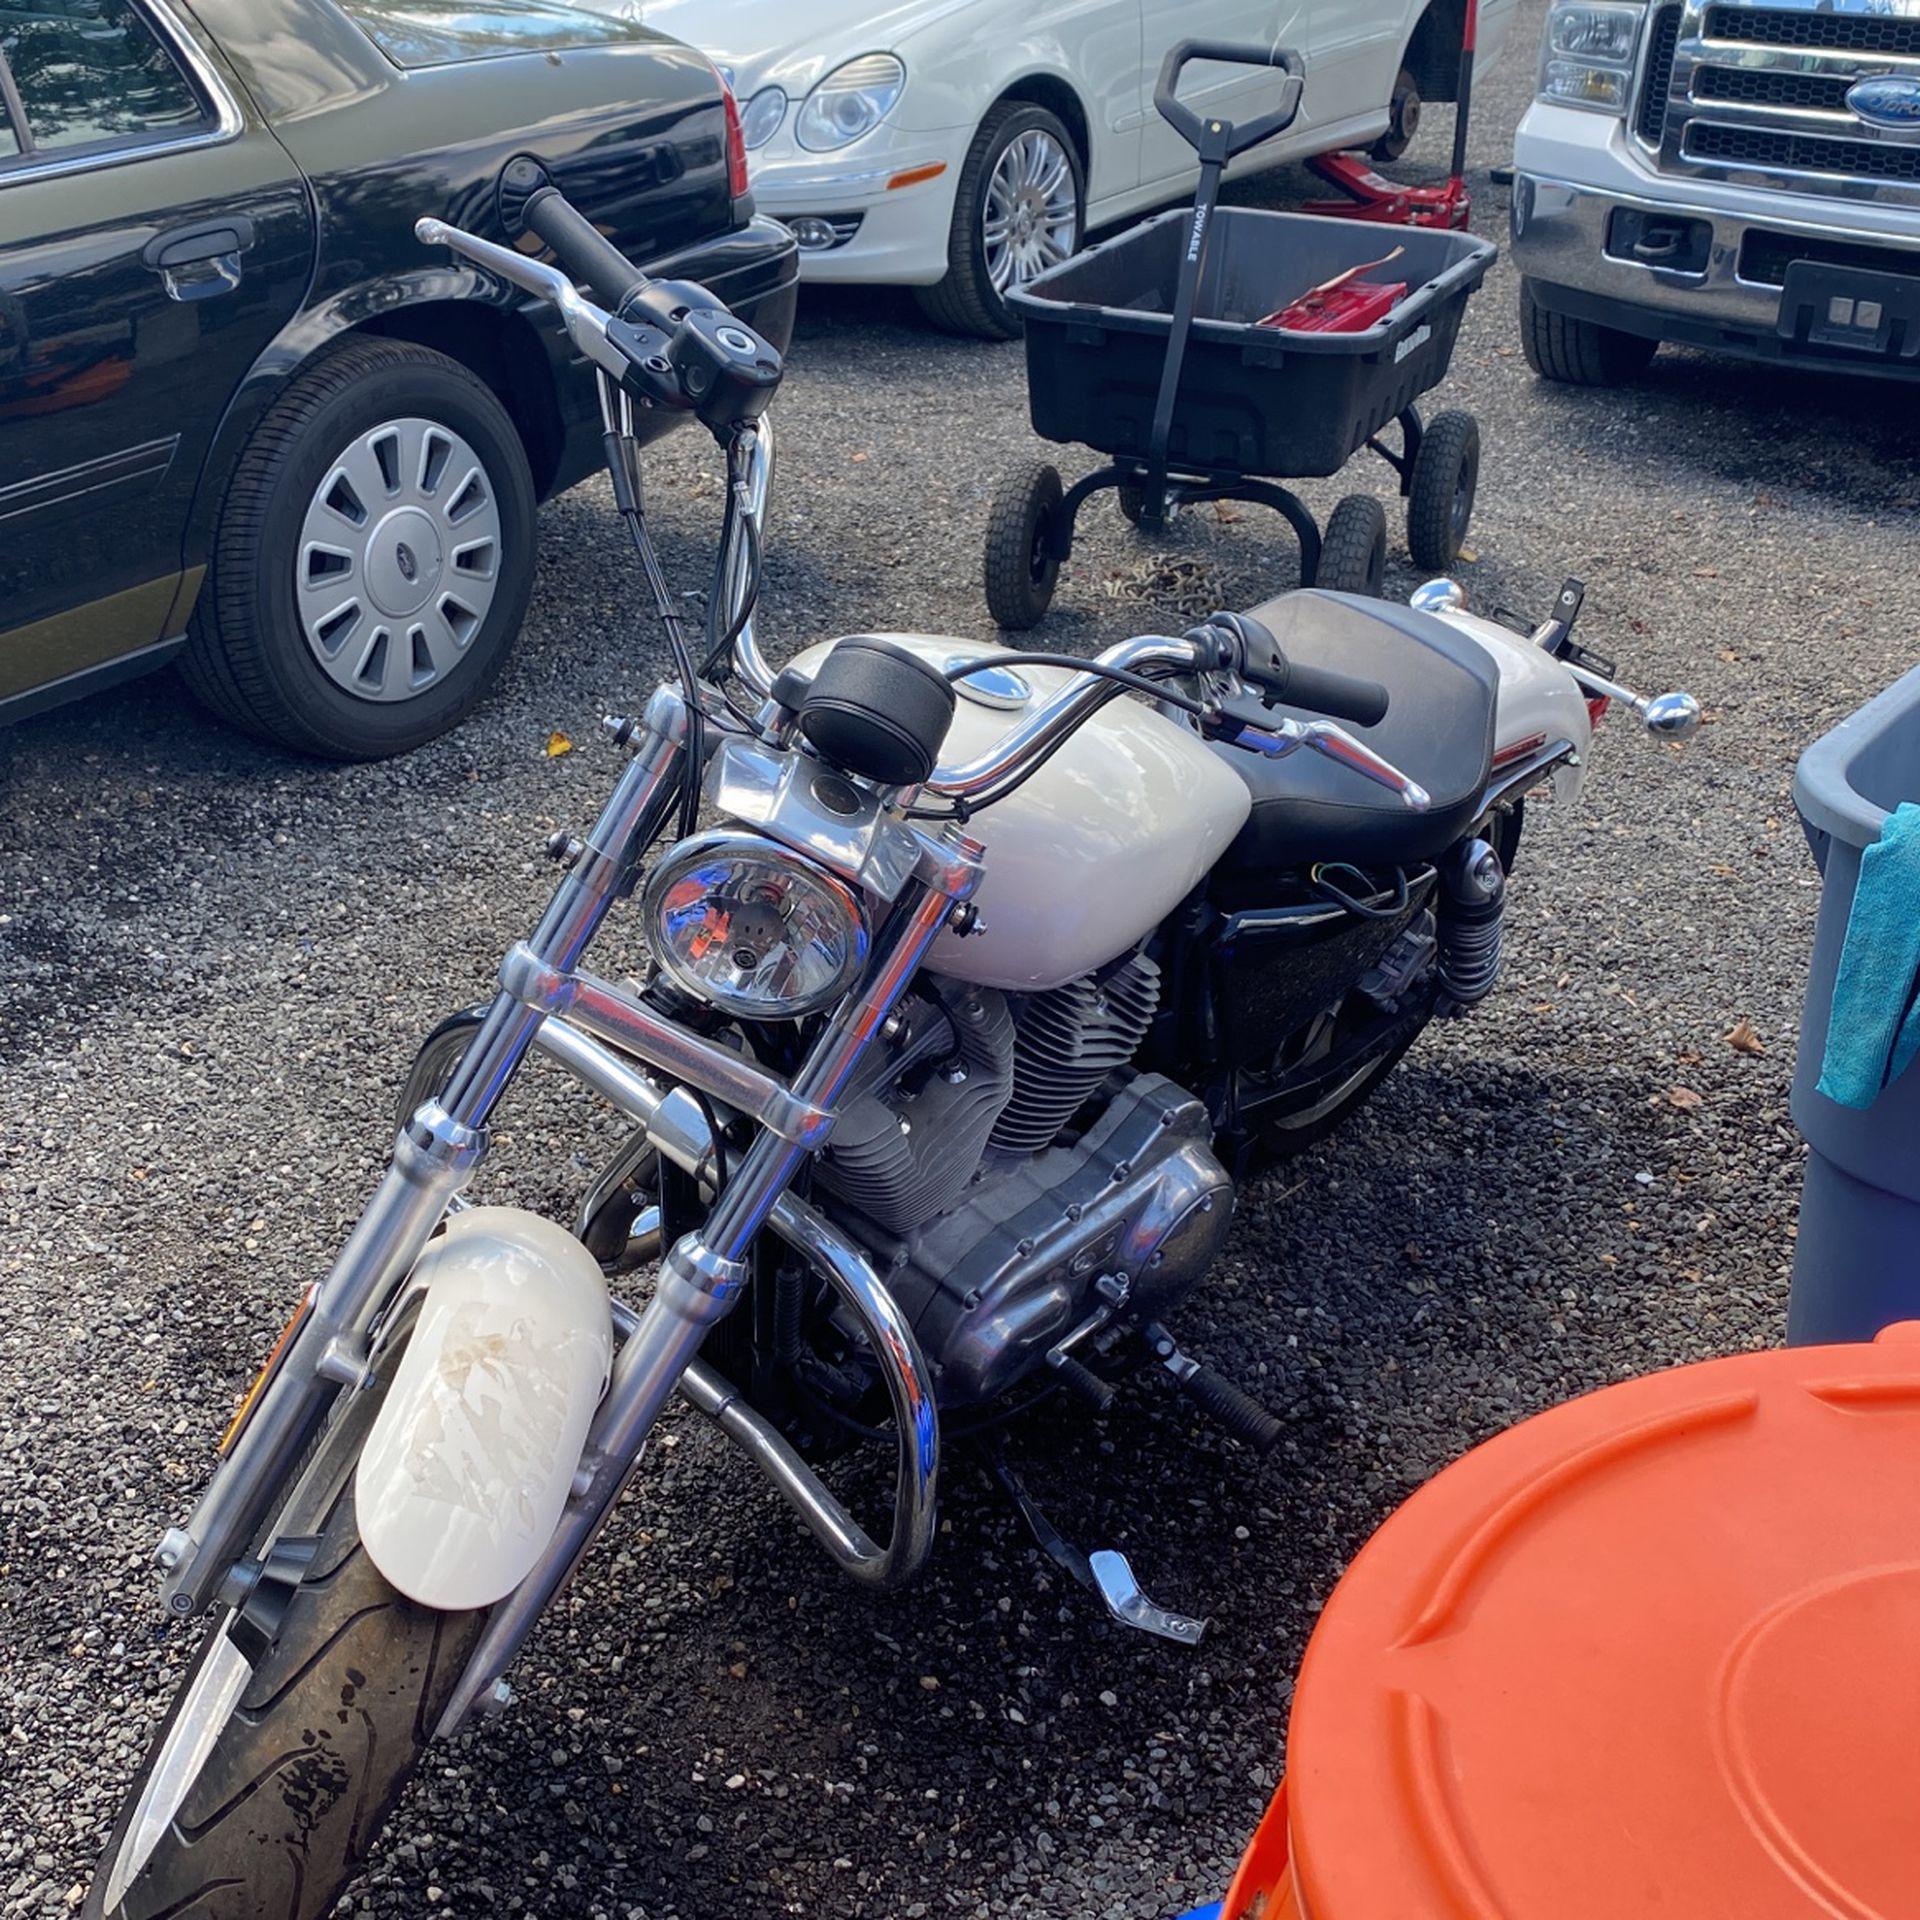 2018 Harley Davidson 883